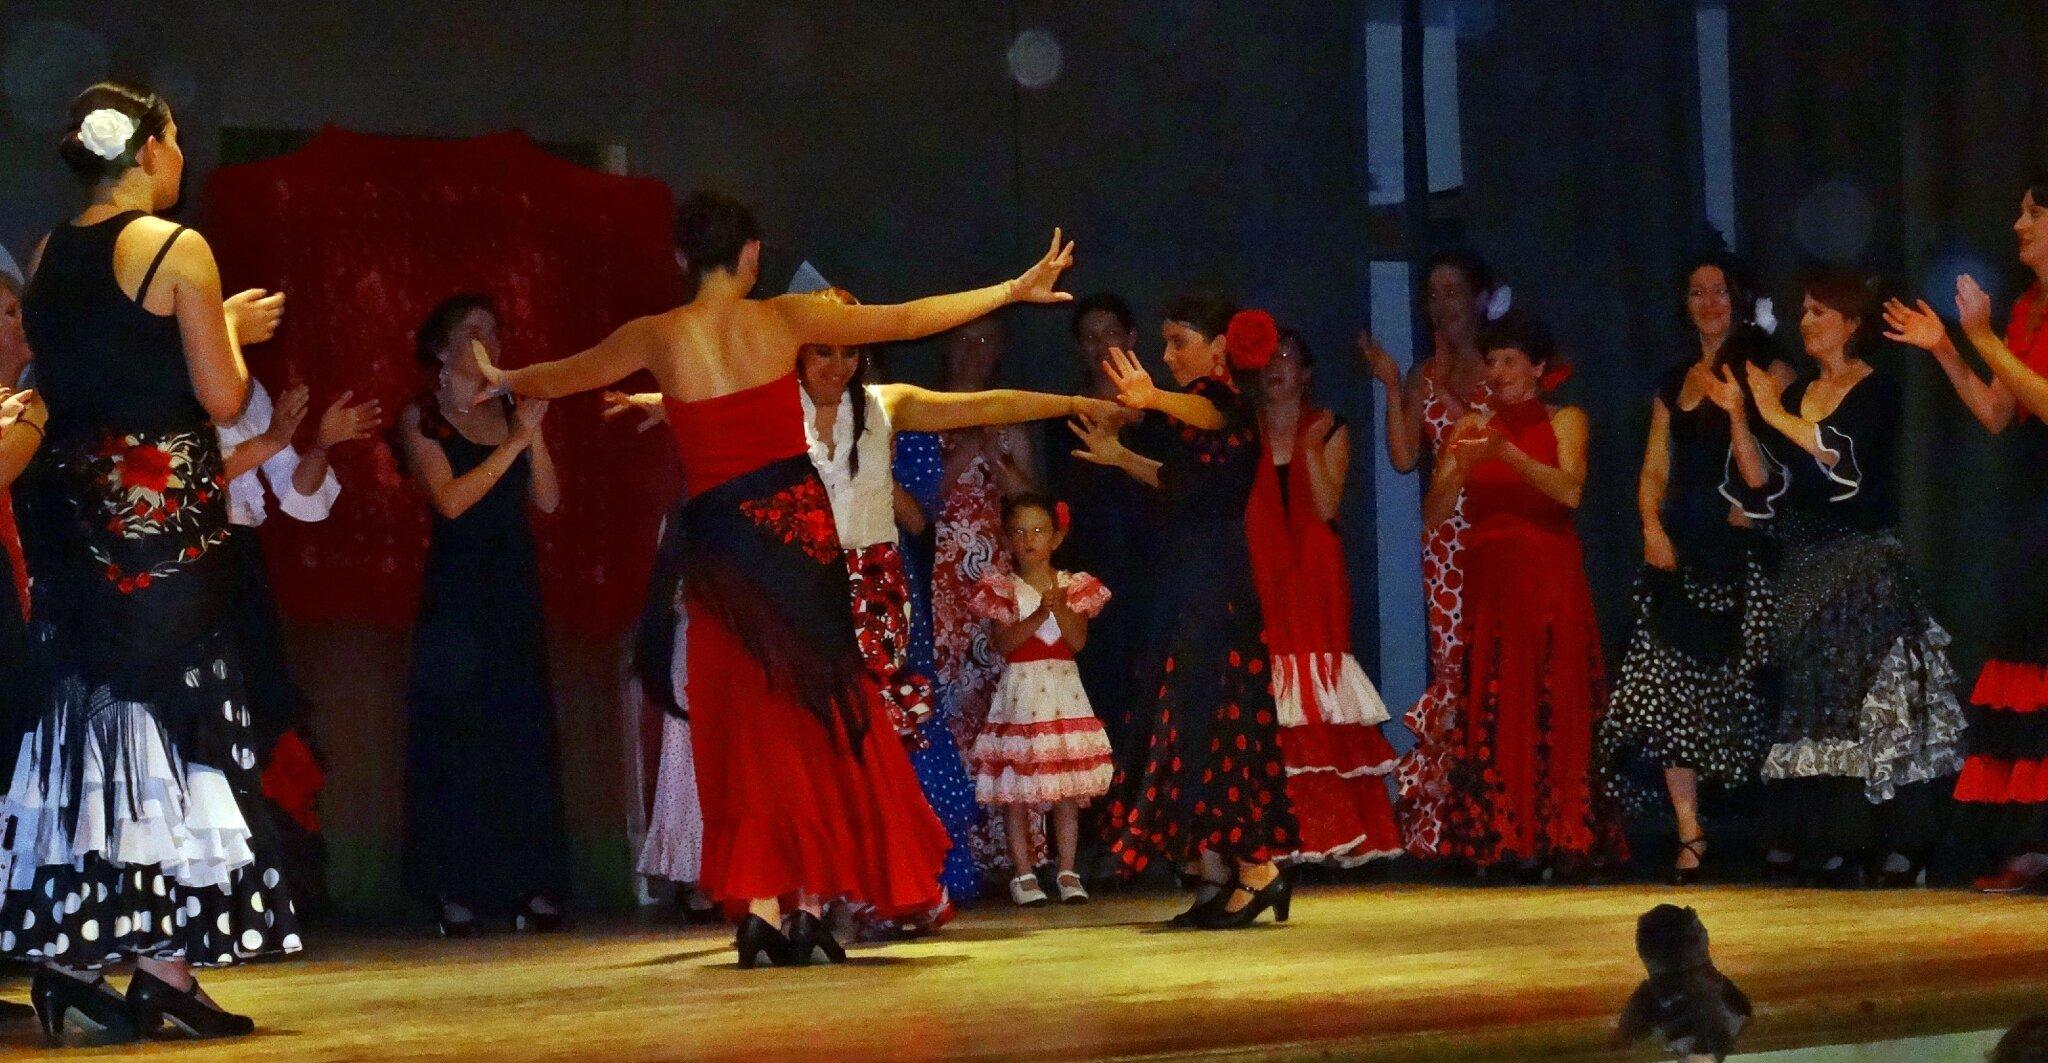 Gala SIN EMBARGO 28 juin 2015 Sainte-Croix-du-Mont (63)